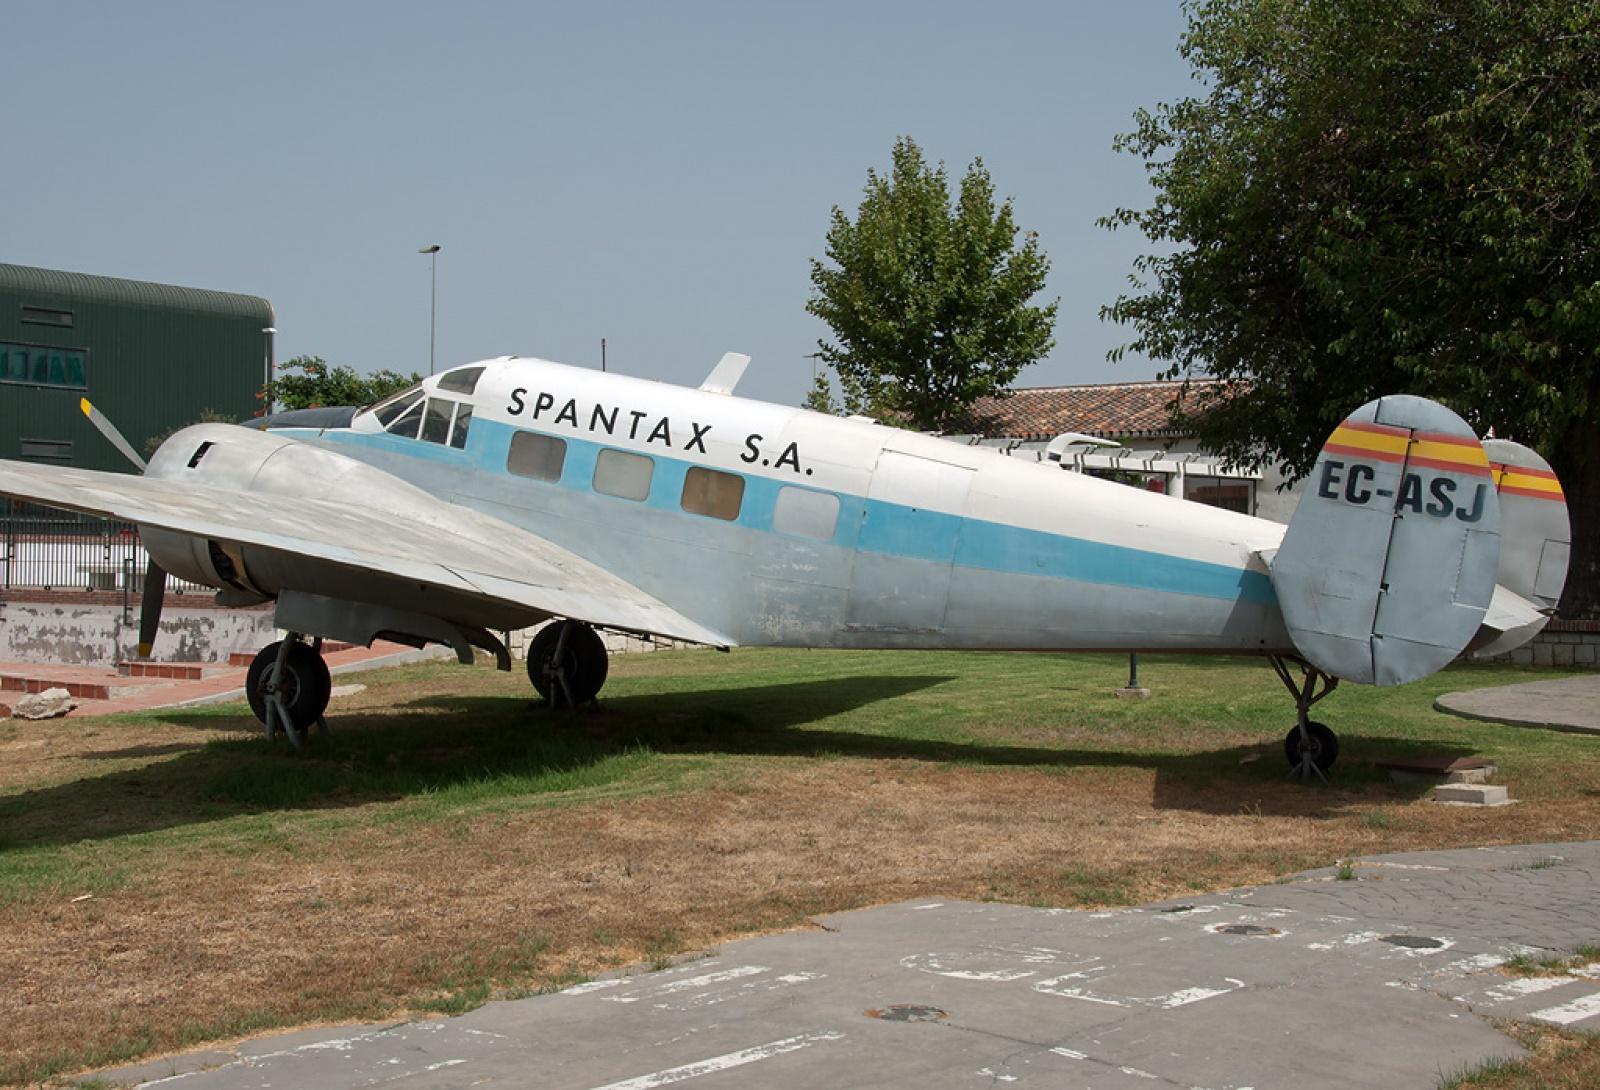 FRA: Photos anciens avions des FRA - Page 5 8761747790404216f6360d2515b